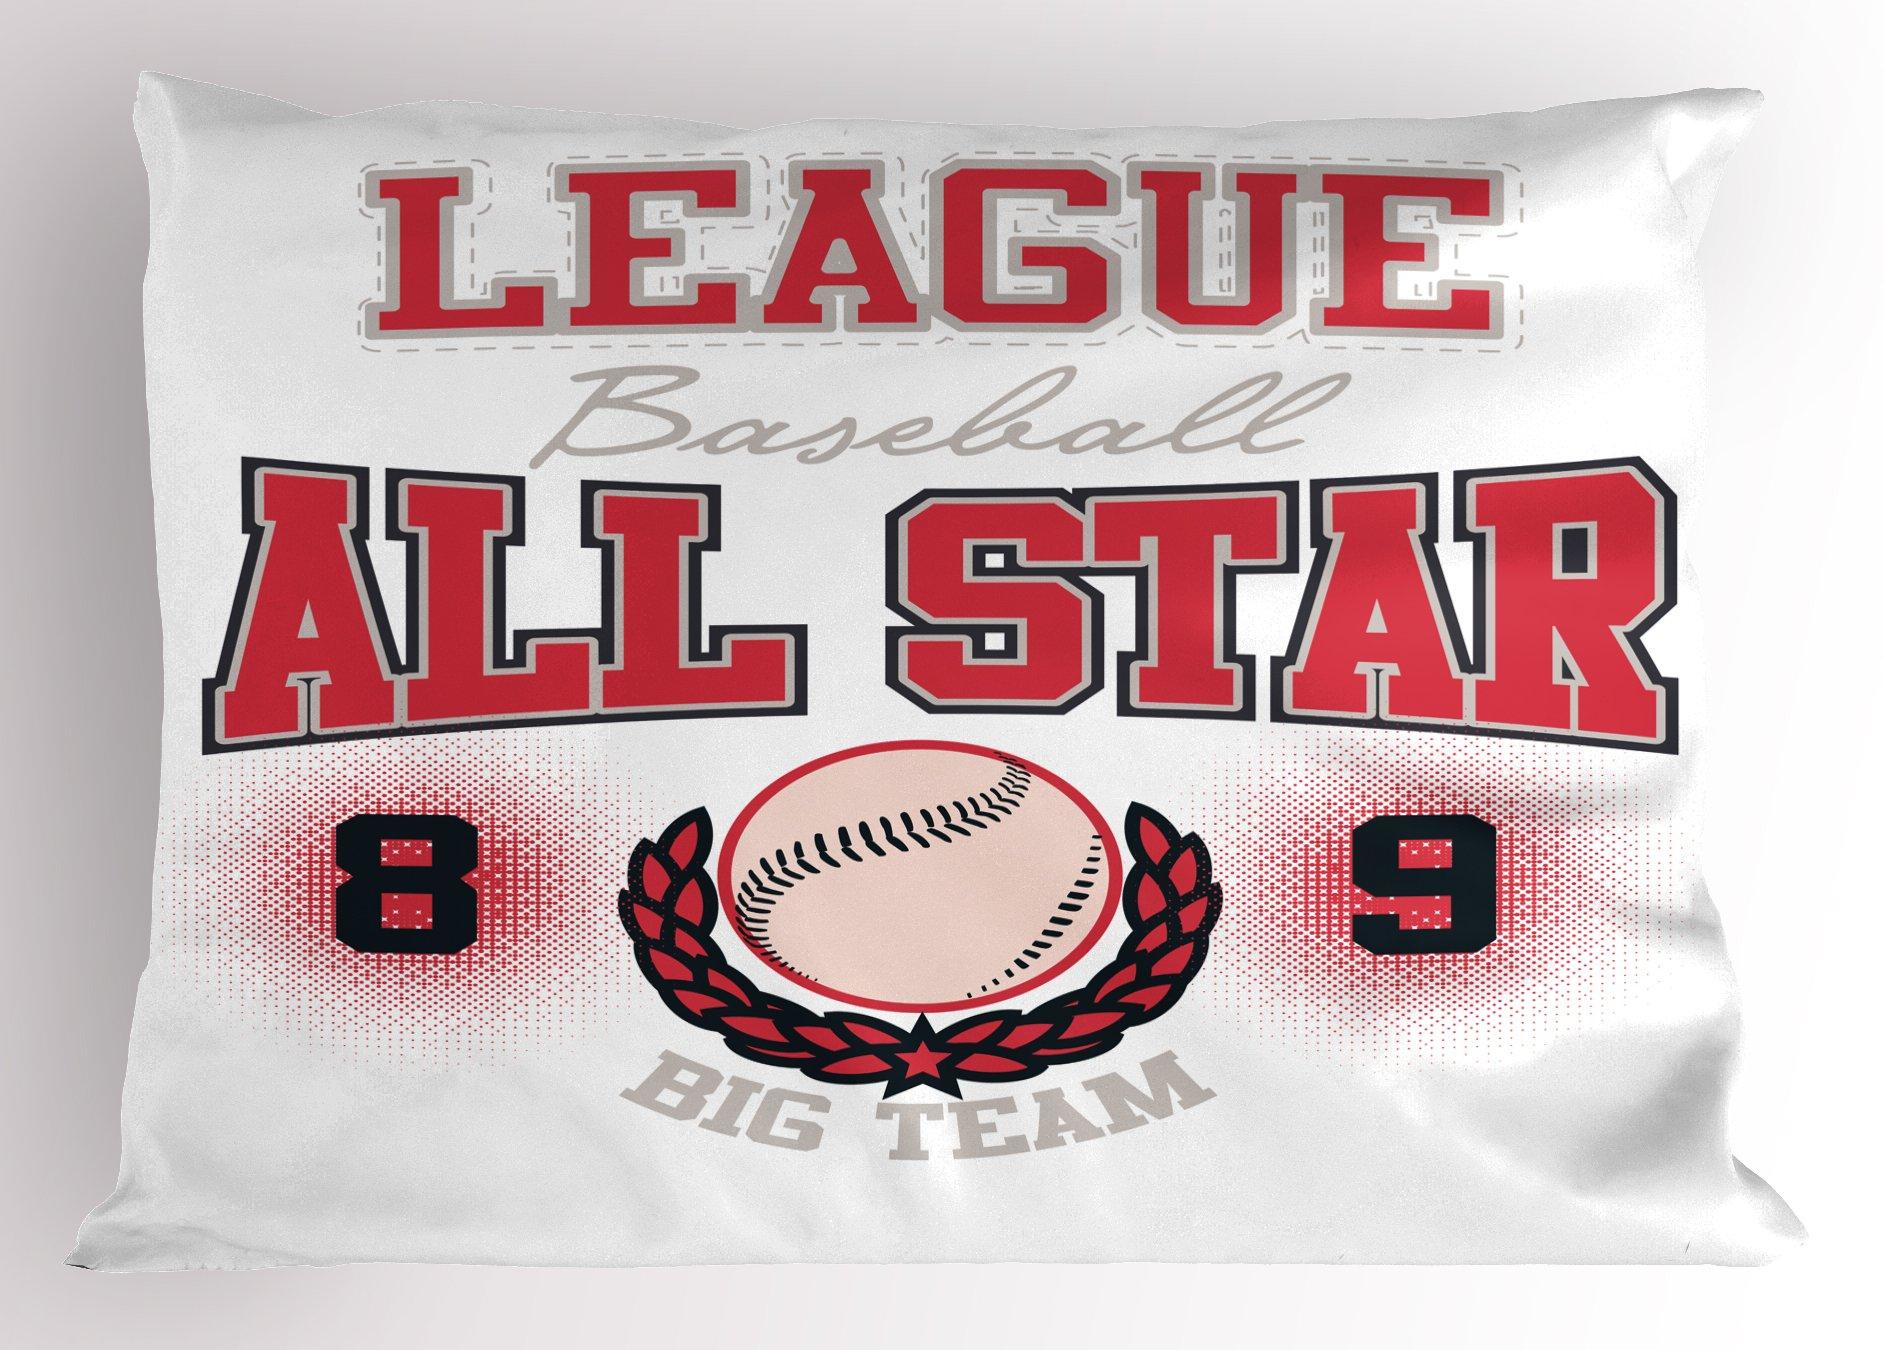 Ambesonne Sports Pillow Sham, College Baseball Softball Player League All Star Big Team Badge Champion, Decorative Standard King Size Printed Pillowcase, 36 X 20 inches, Dark Coral Black Peach